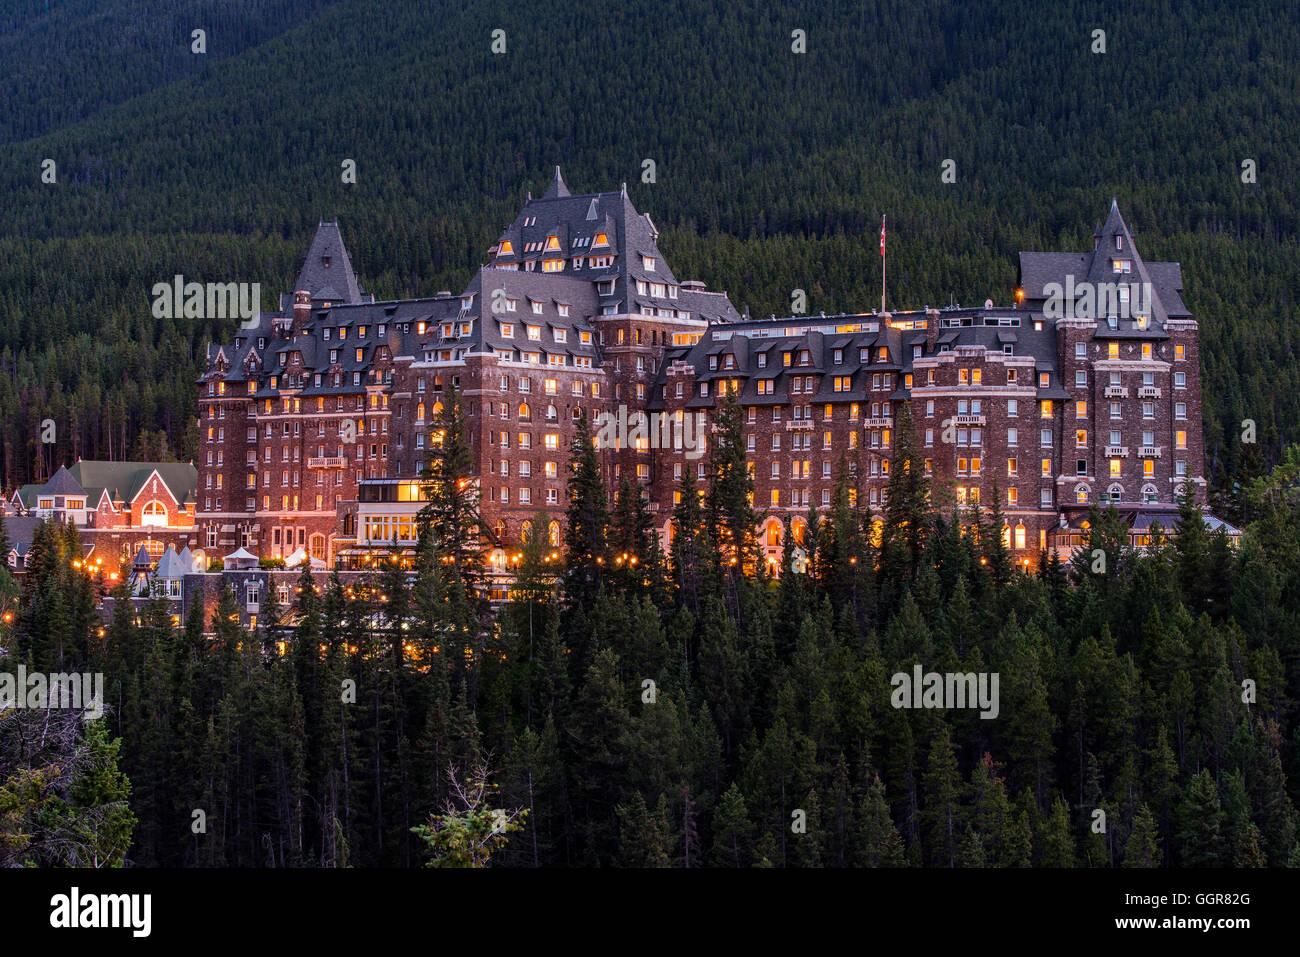 Fairmont Hotel Lake Louise Banff Canada